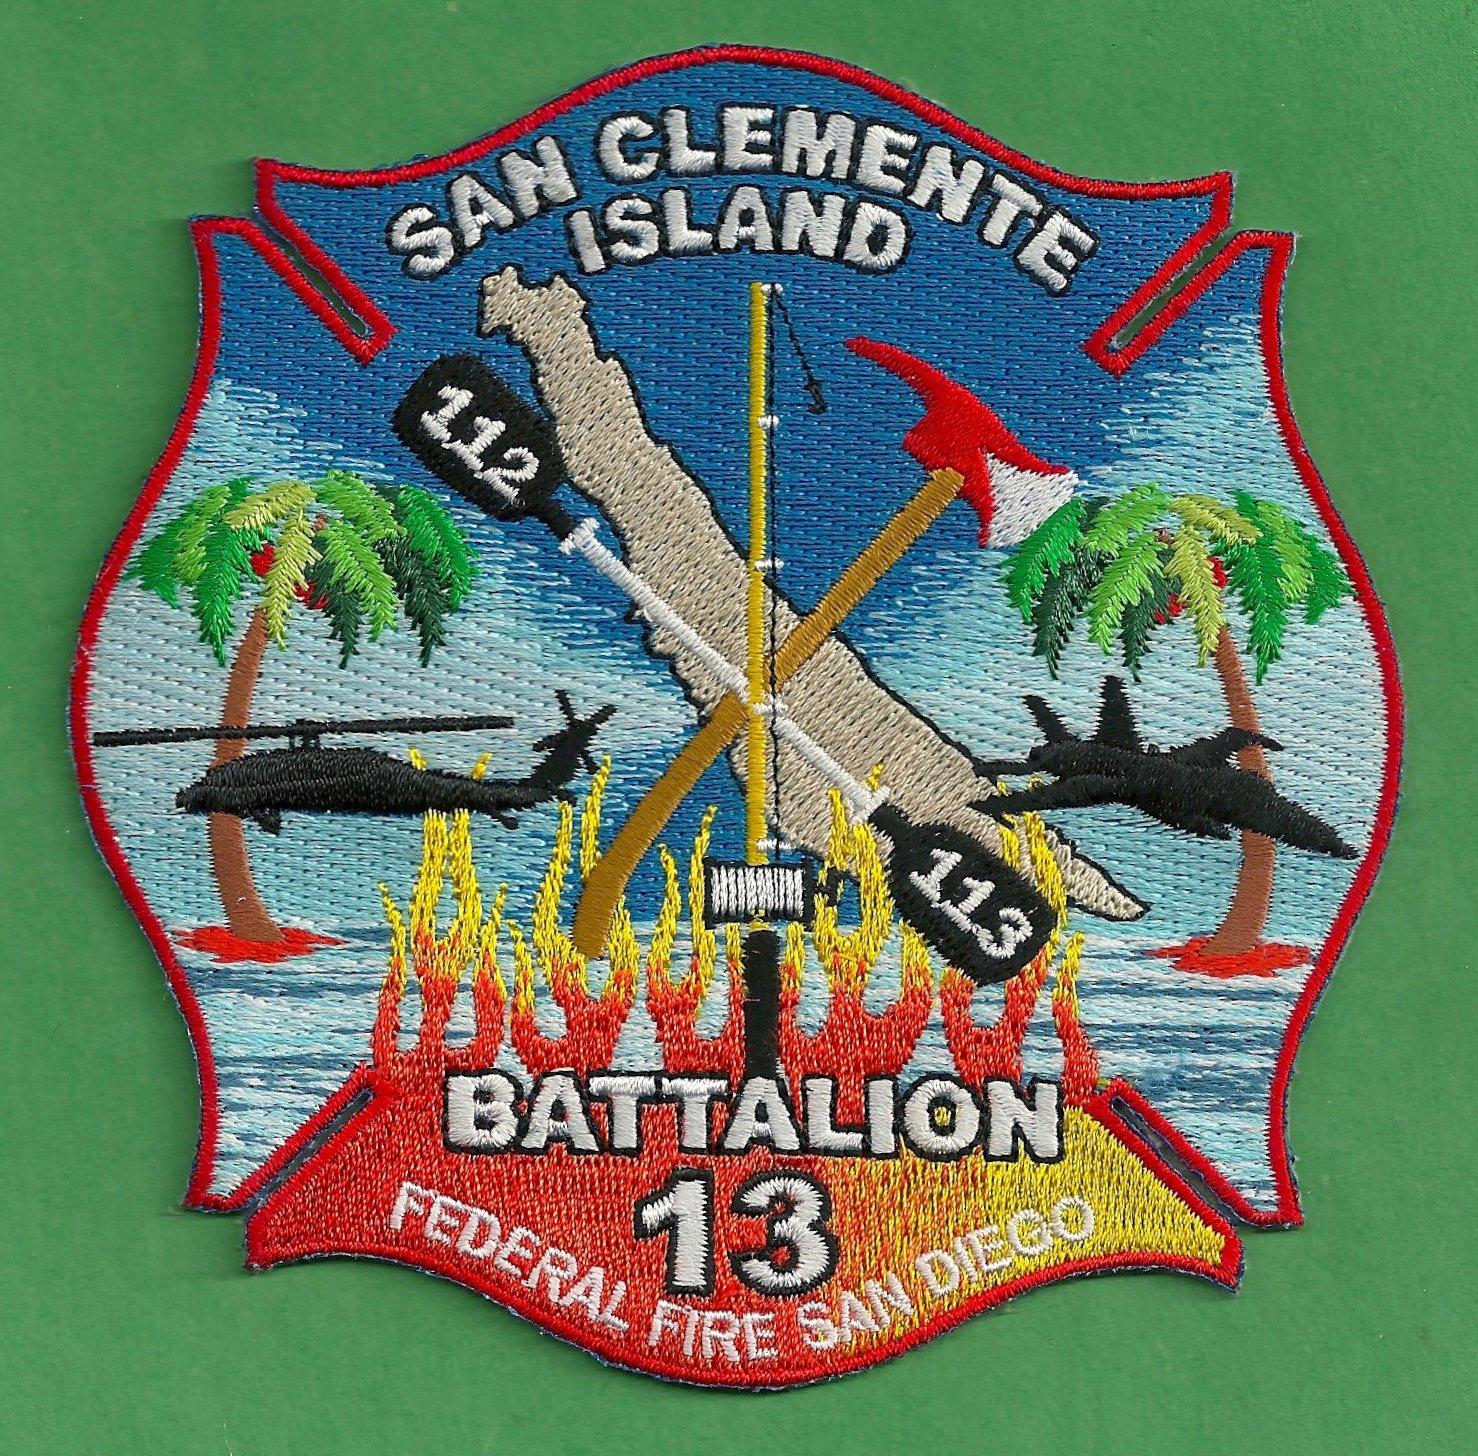 SAN CLEMENTE ISLAND NAVAL AIR FACILITY CALIFORNIA FIRE PATCH